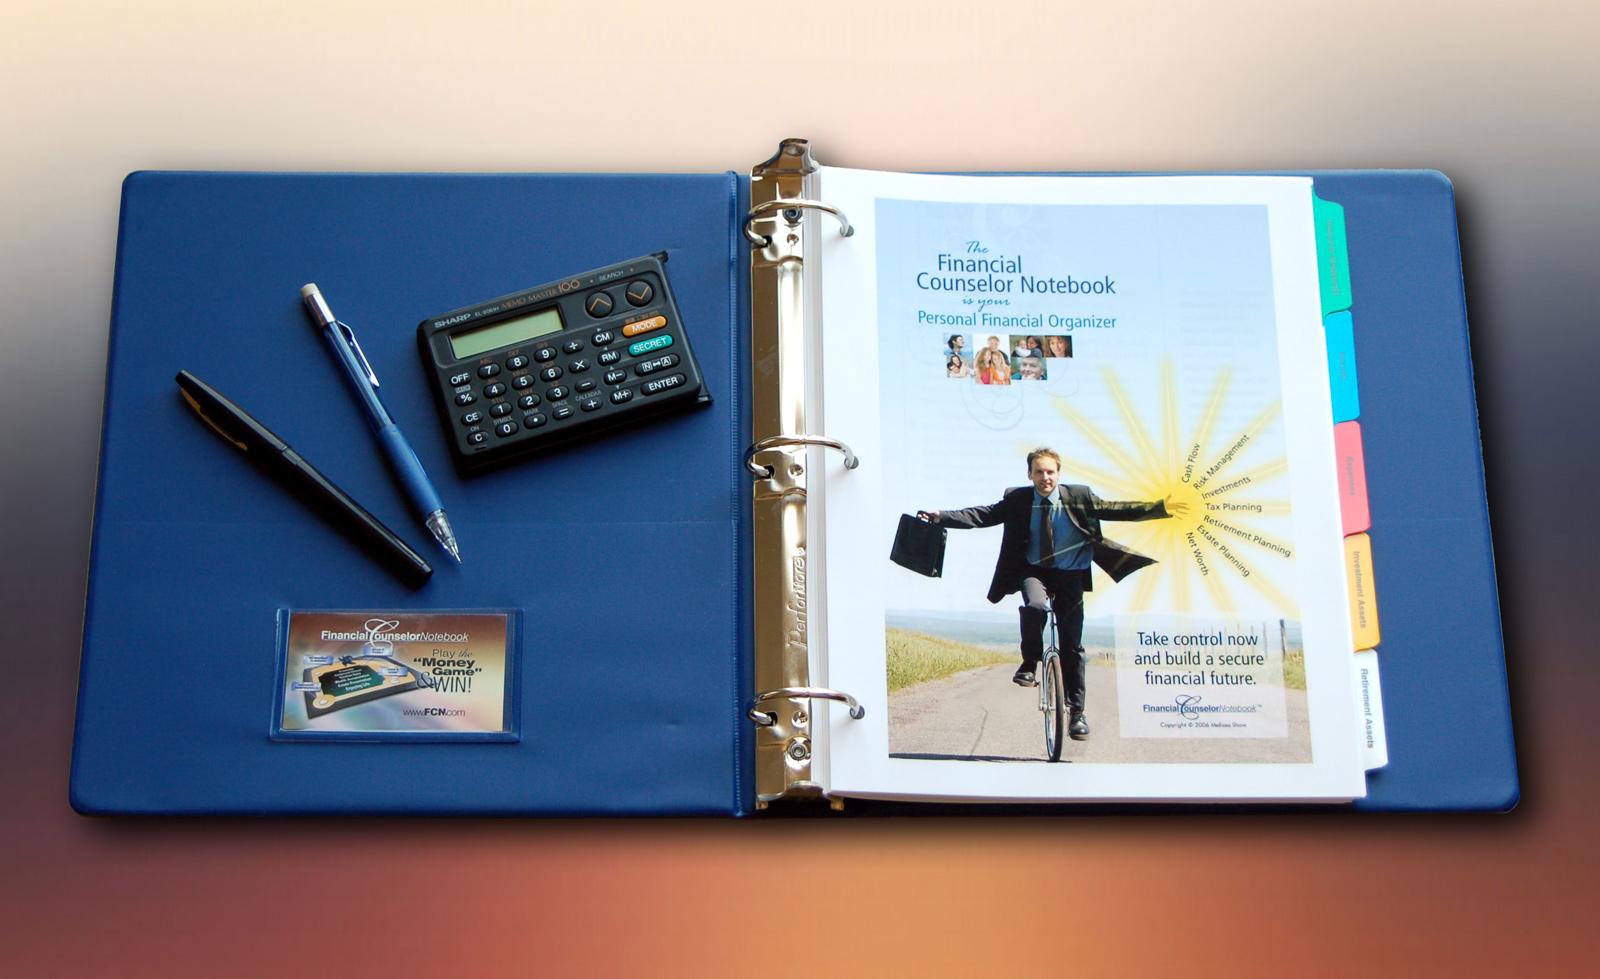 Financial Counselor Notebook